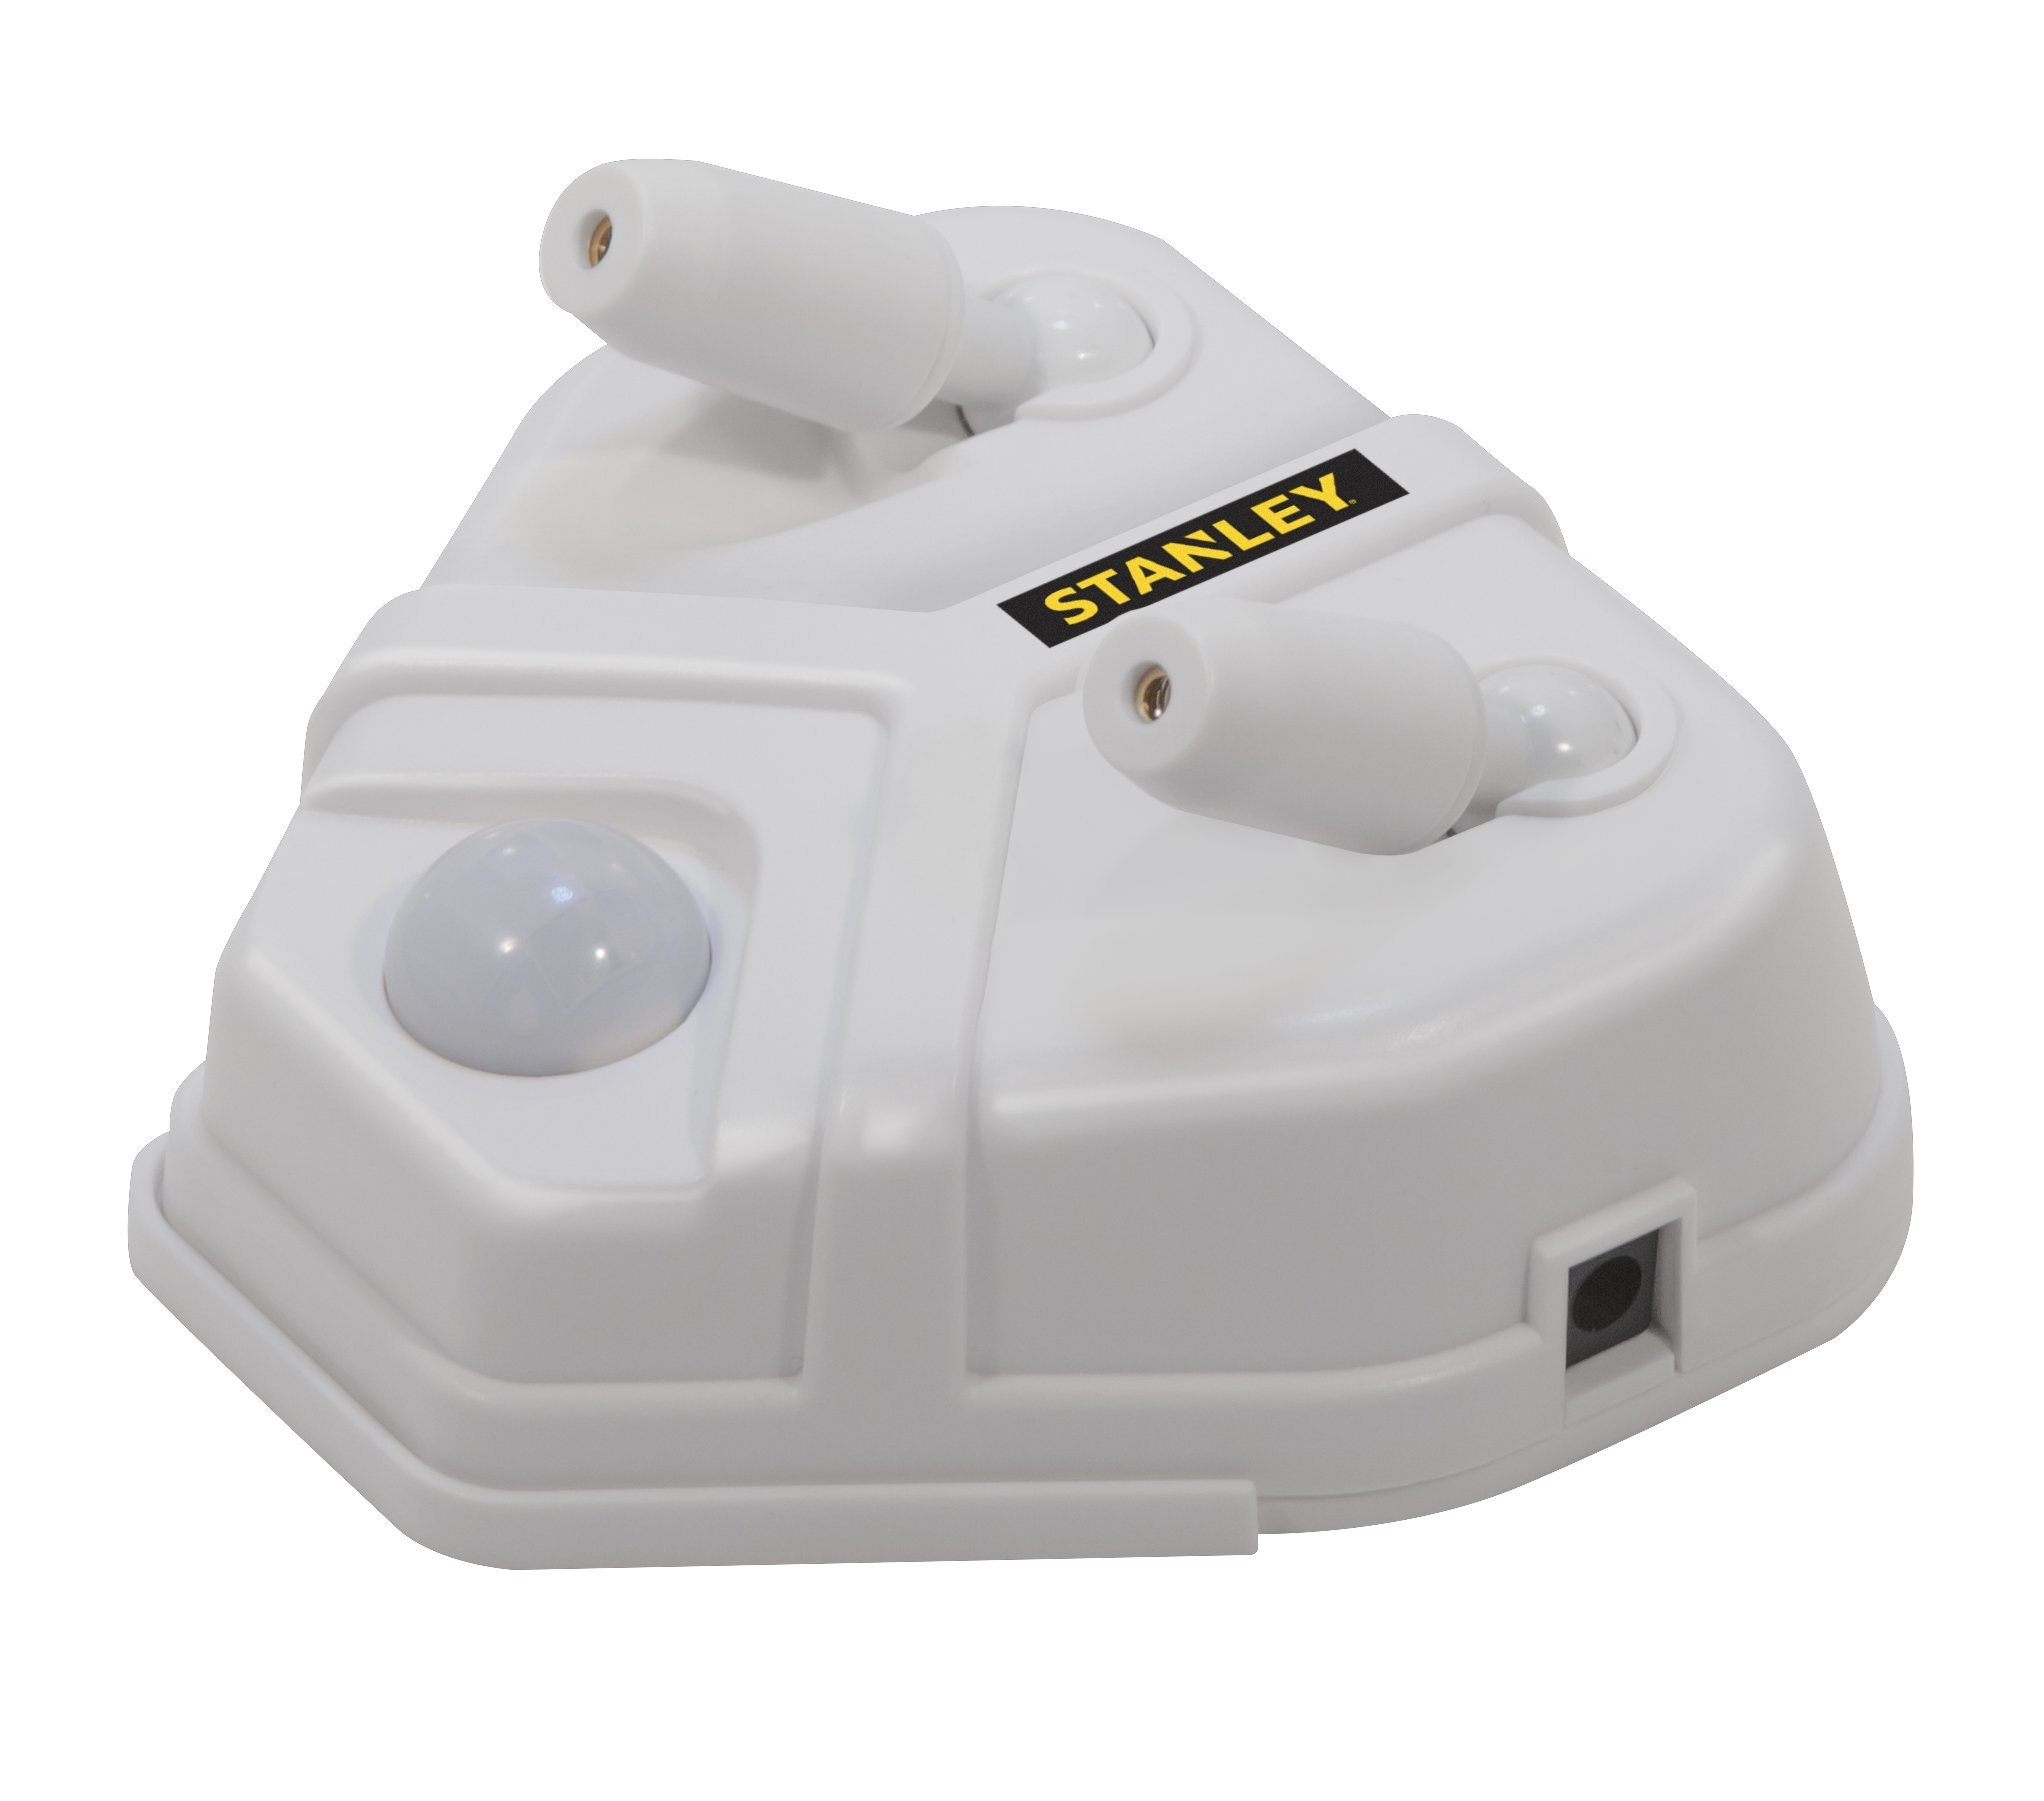 STANLEY GLPS Adjustable Dual Laser Garage Parking Aid, Motion Activated Car Guide Marker